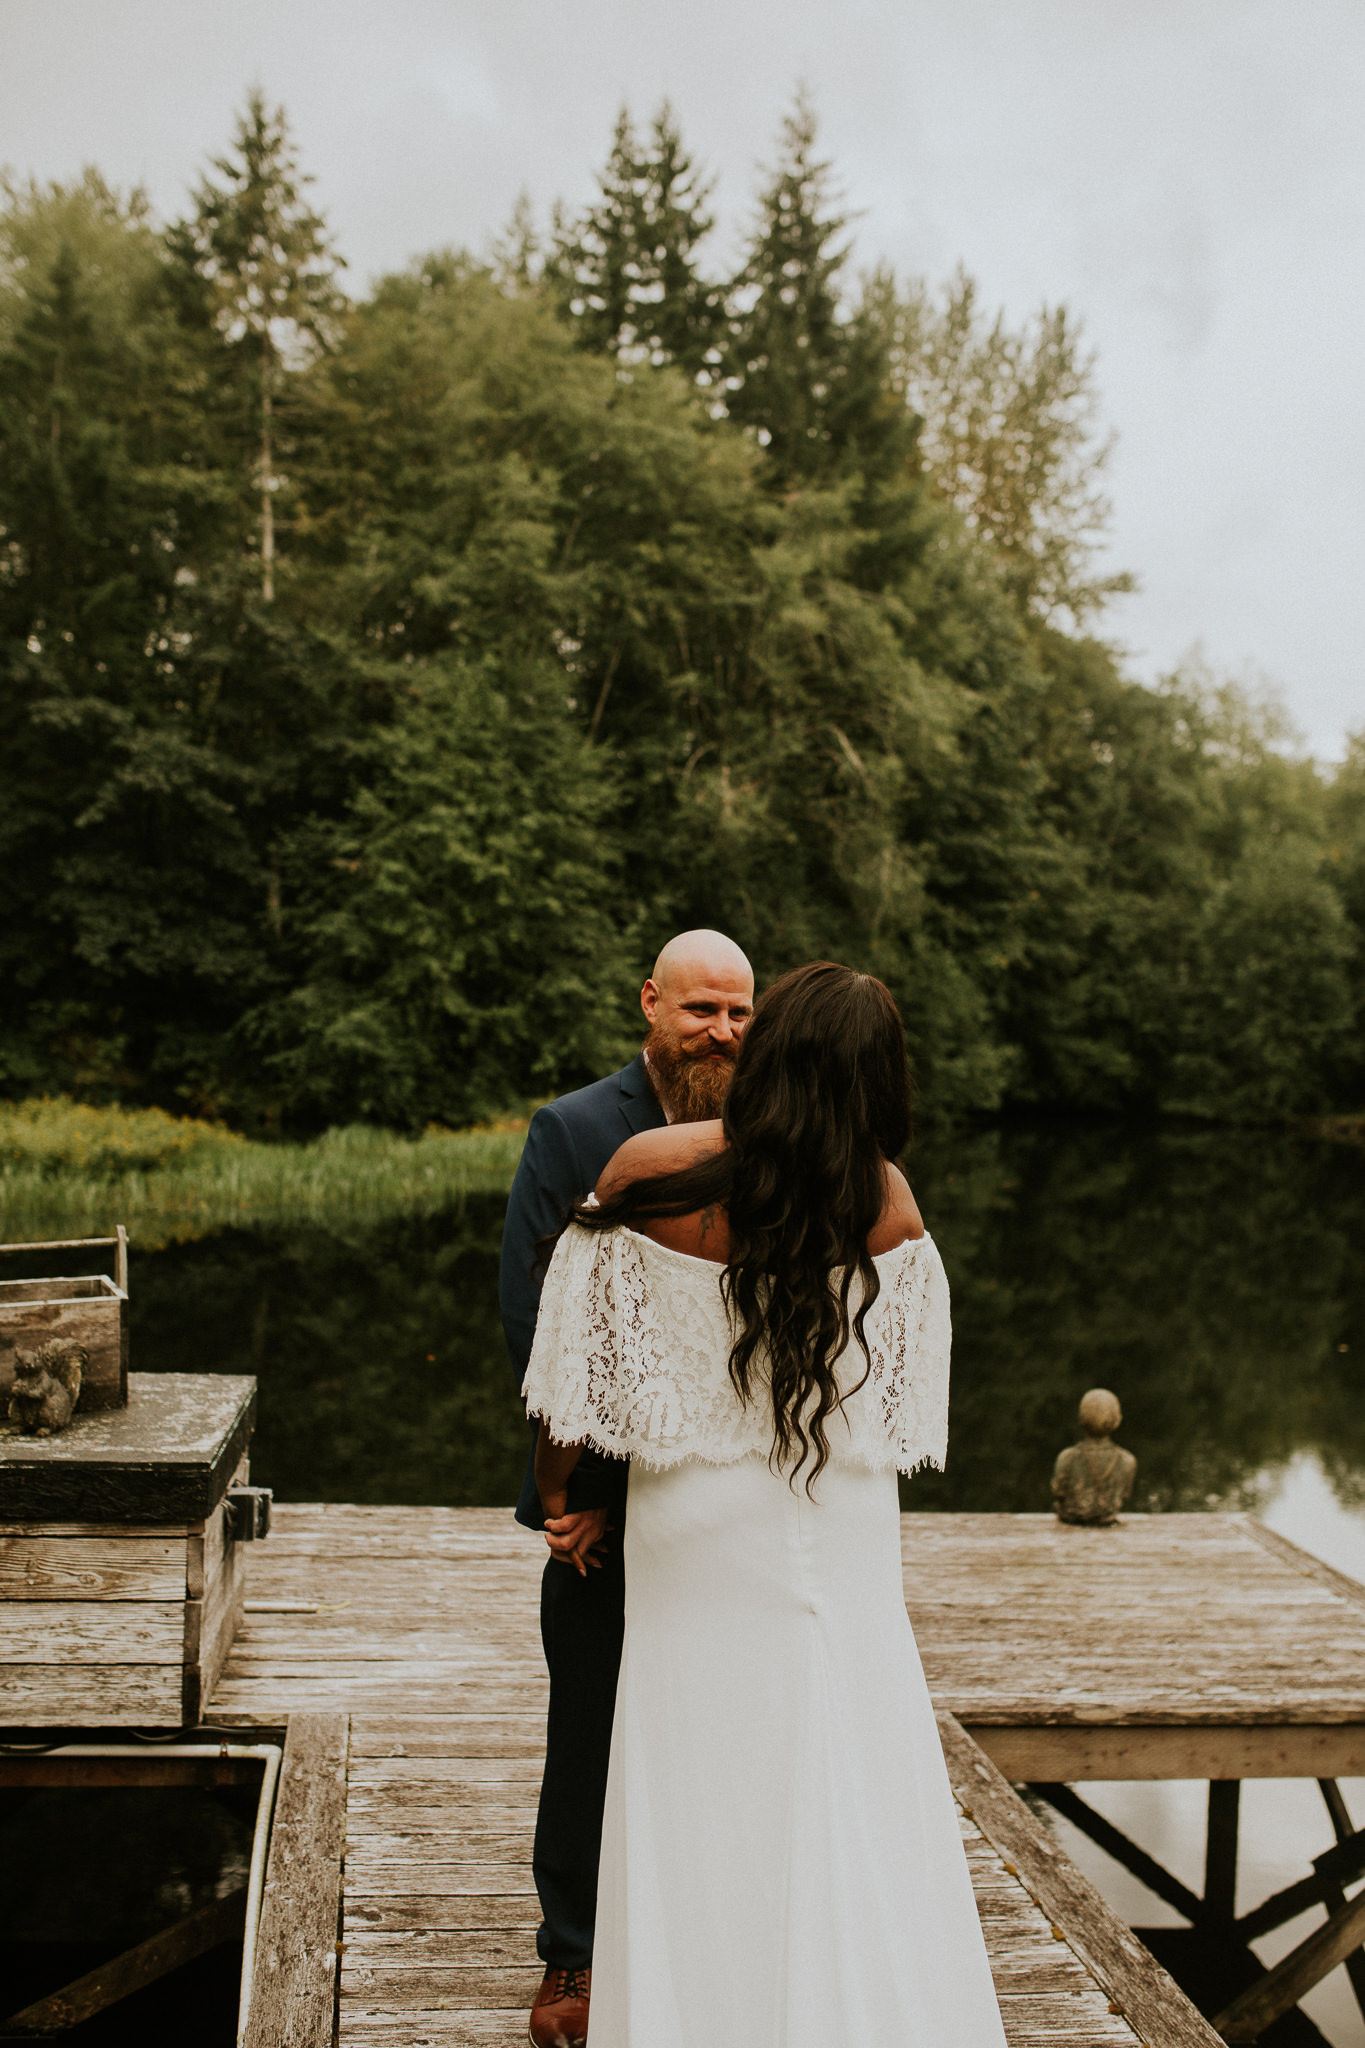 Lakeside-elopement-teasers-9.jpg